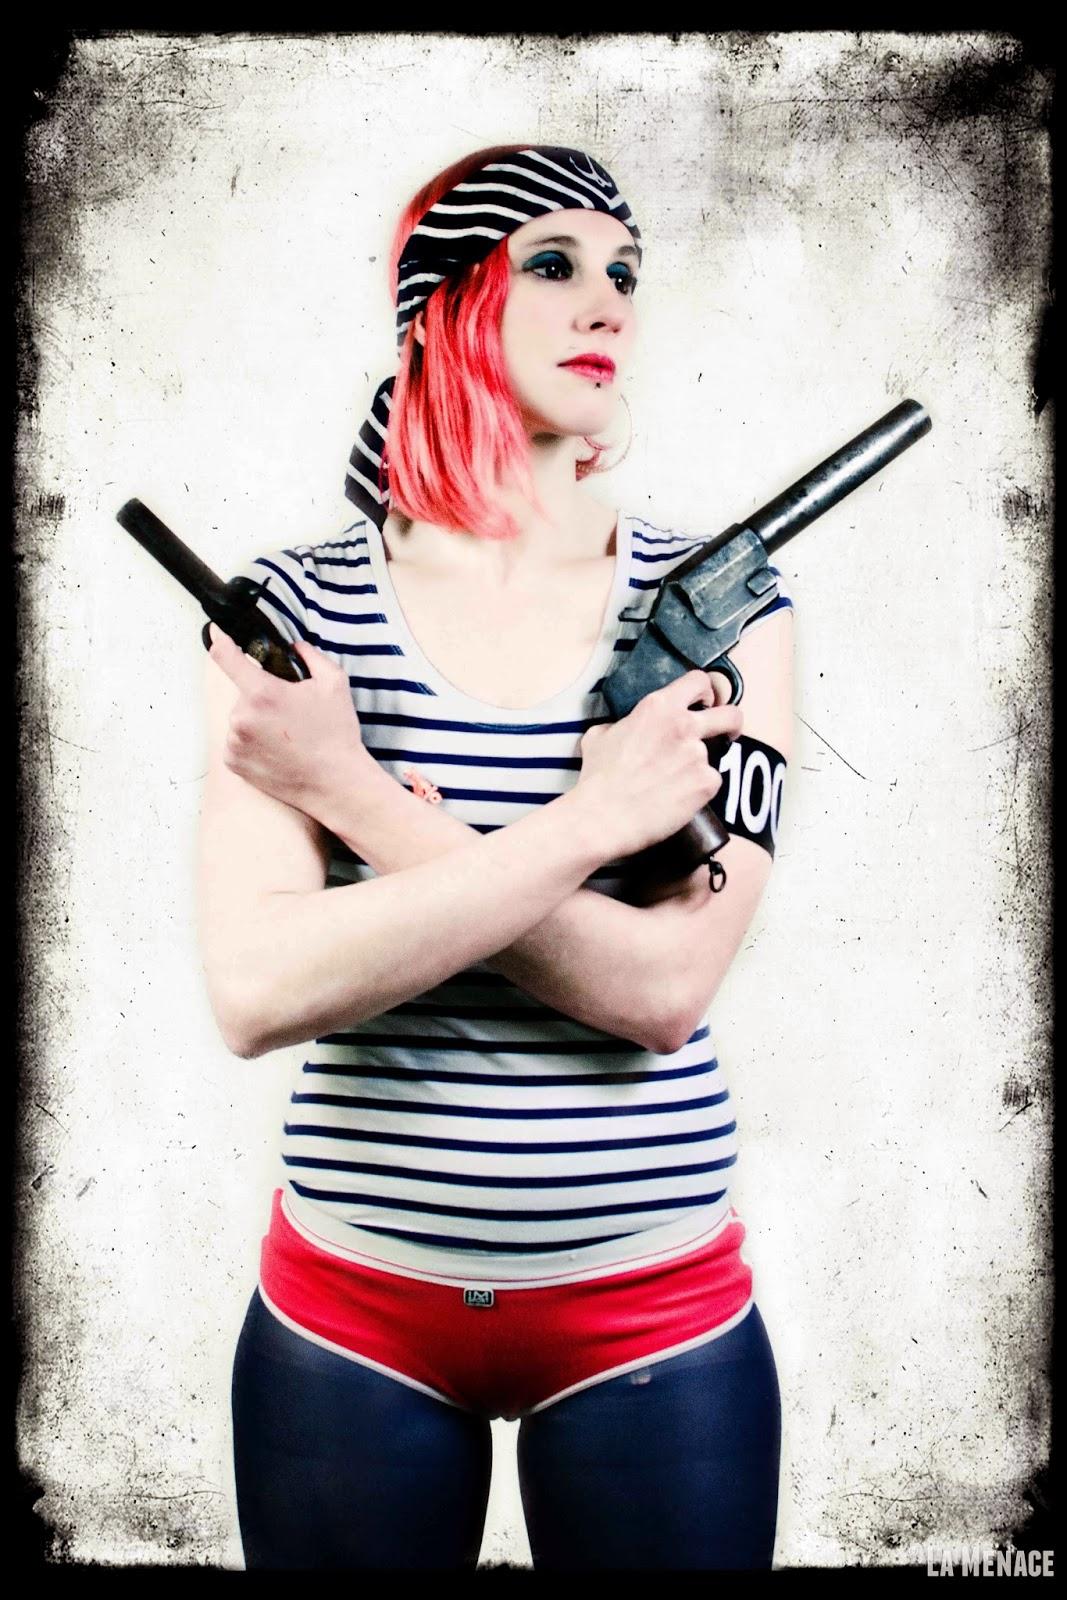 Mathilda May Pussy Best le bloge des grignou (radio canal b, rennes): 2014